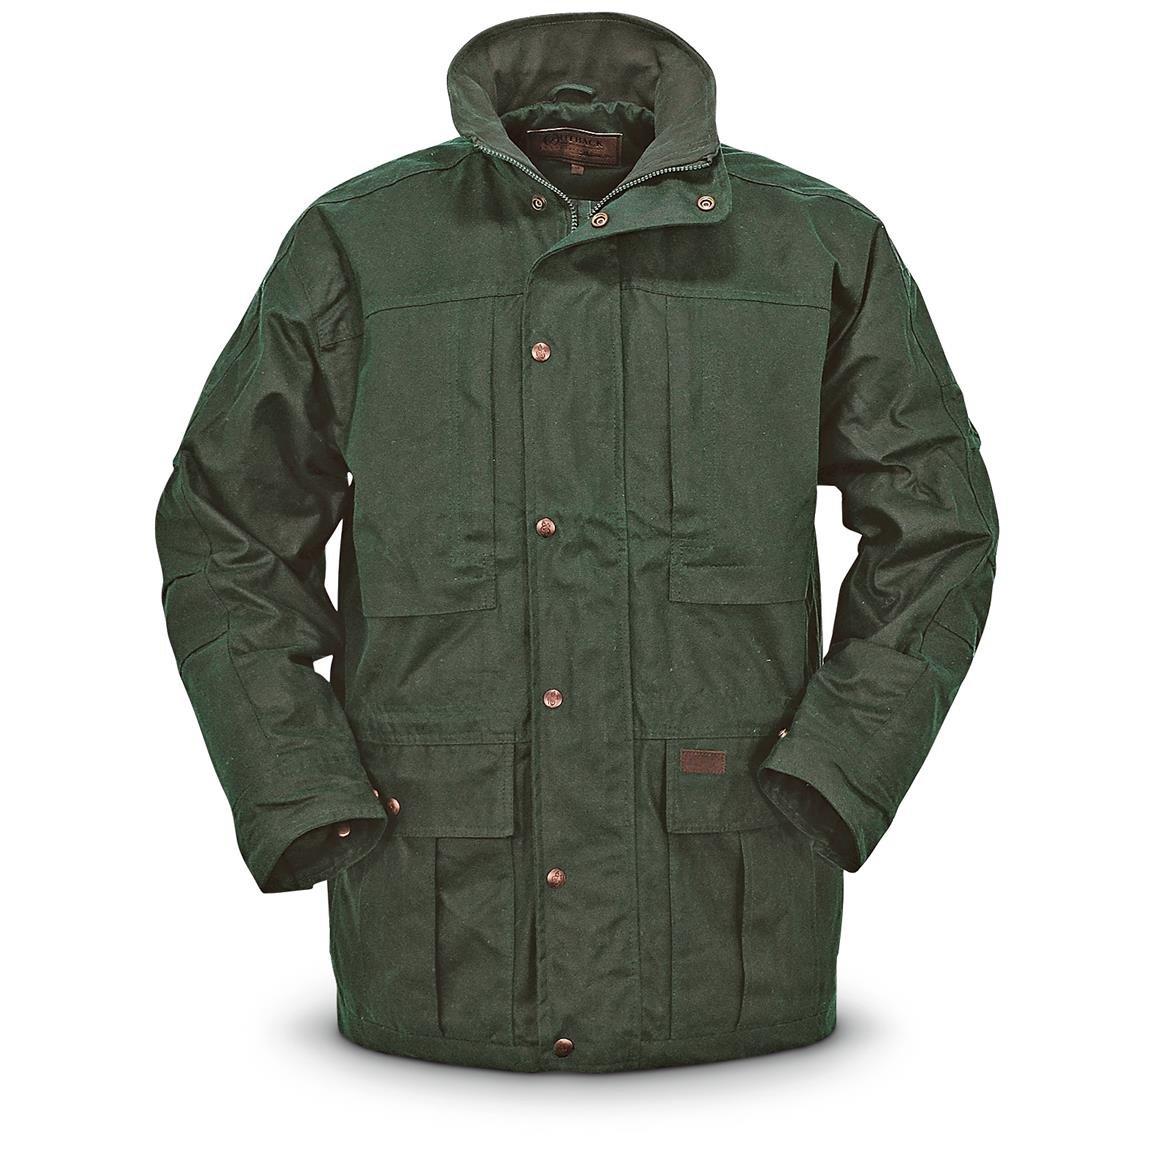 Outback Trading Deer Hunter Waterproof Oilskin Jacket 080317